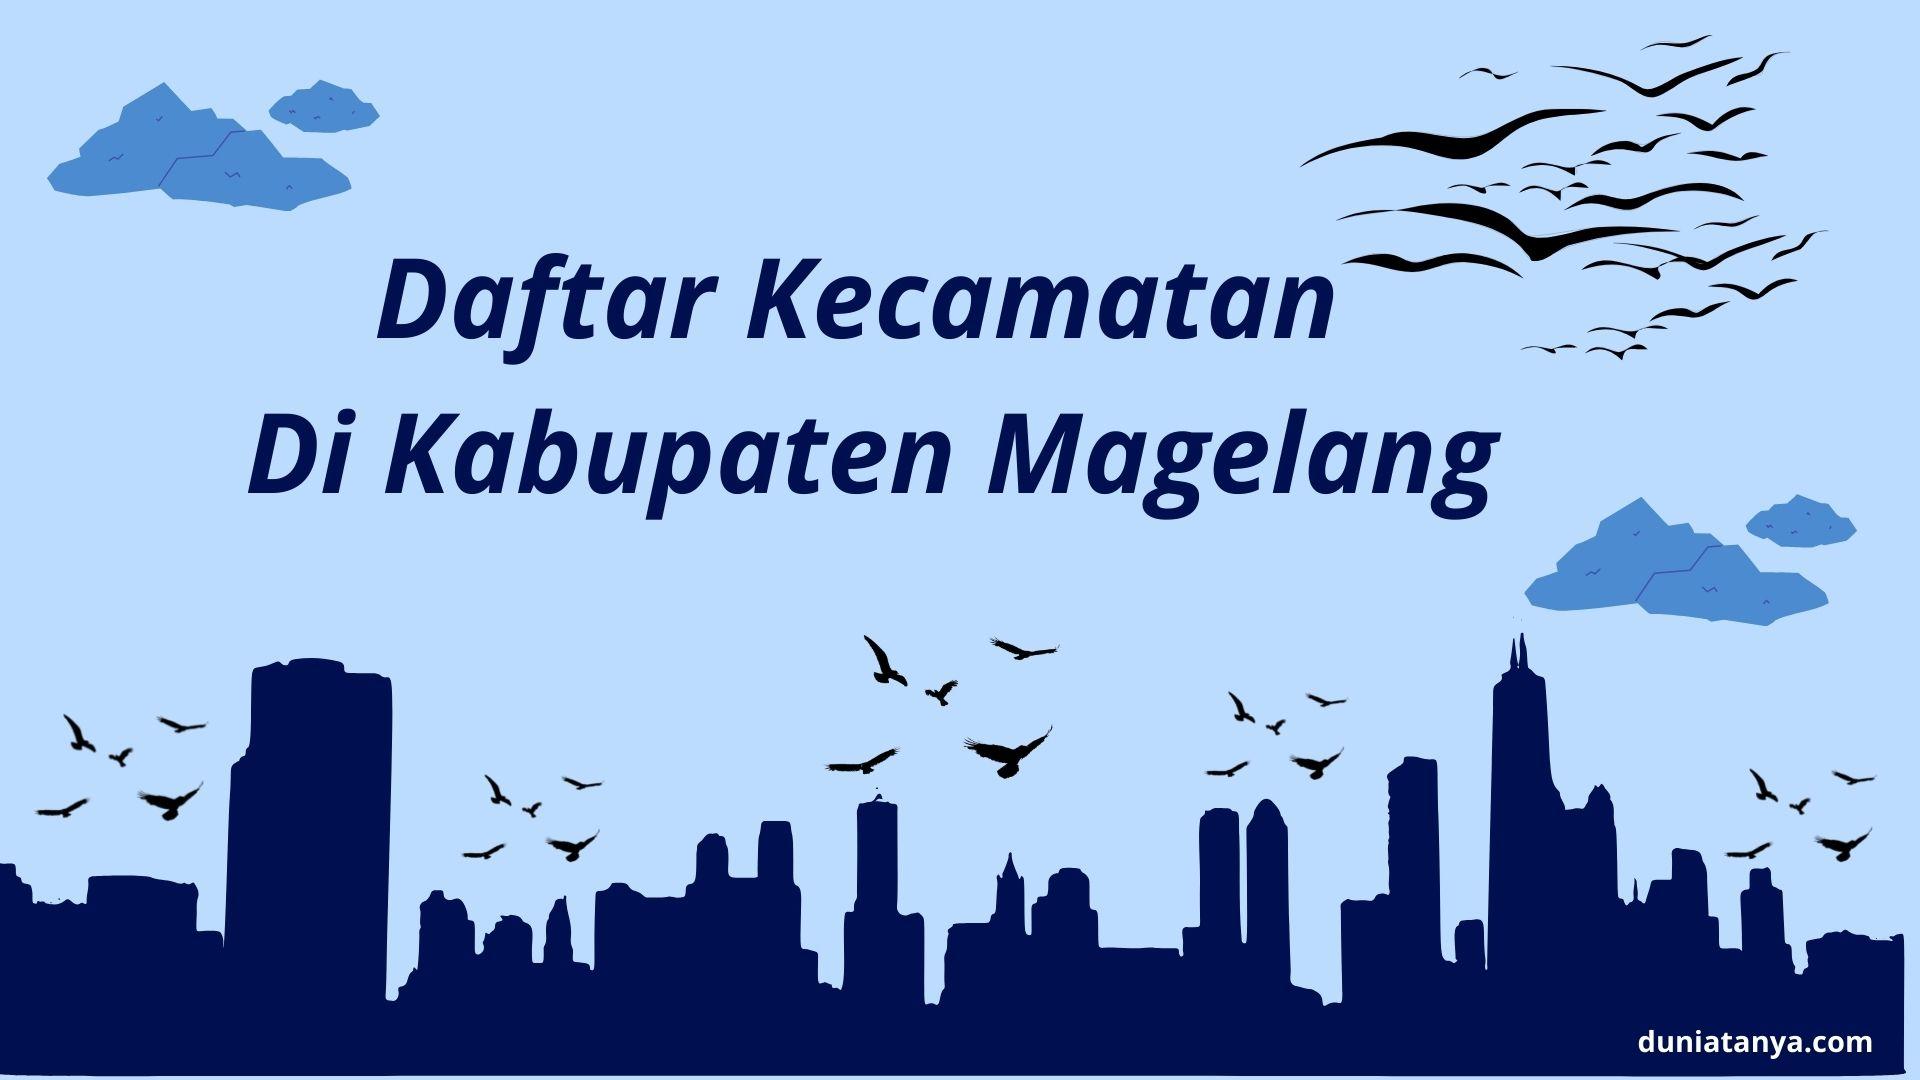 You are currently viewing Daftar Kecamatan Di Kabupaten Magelang